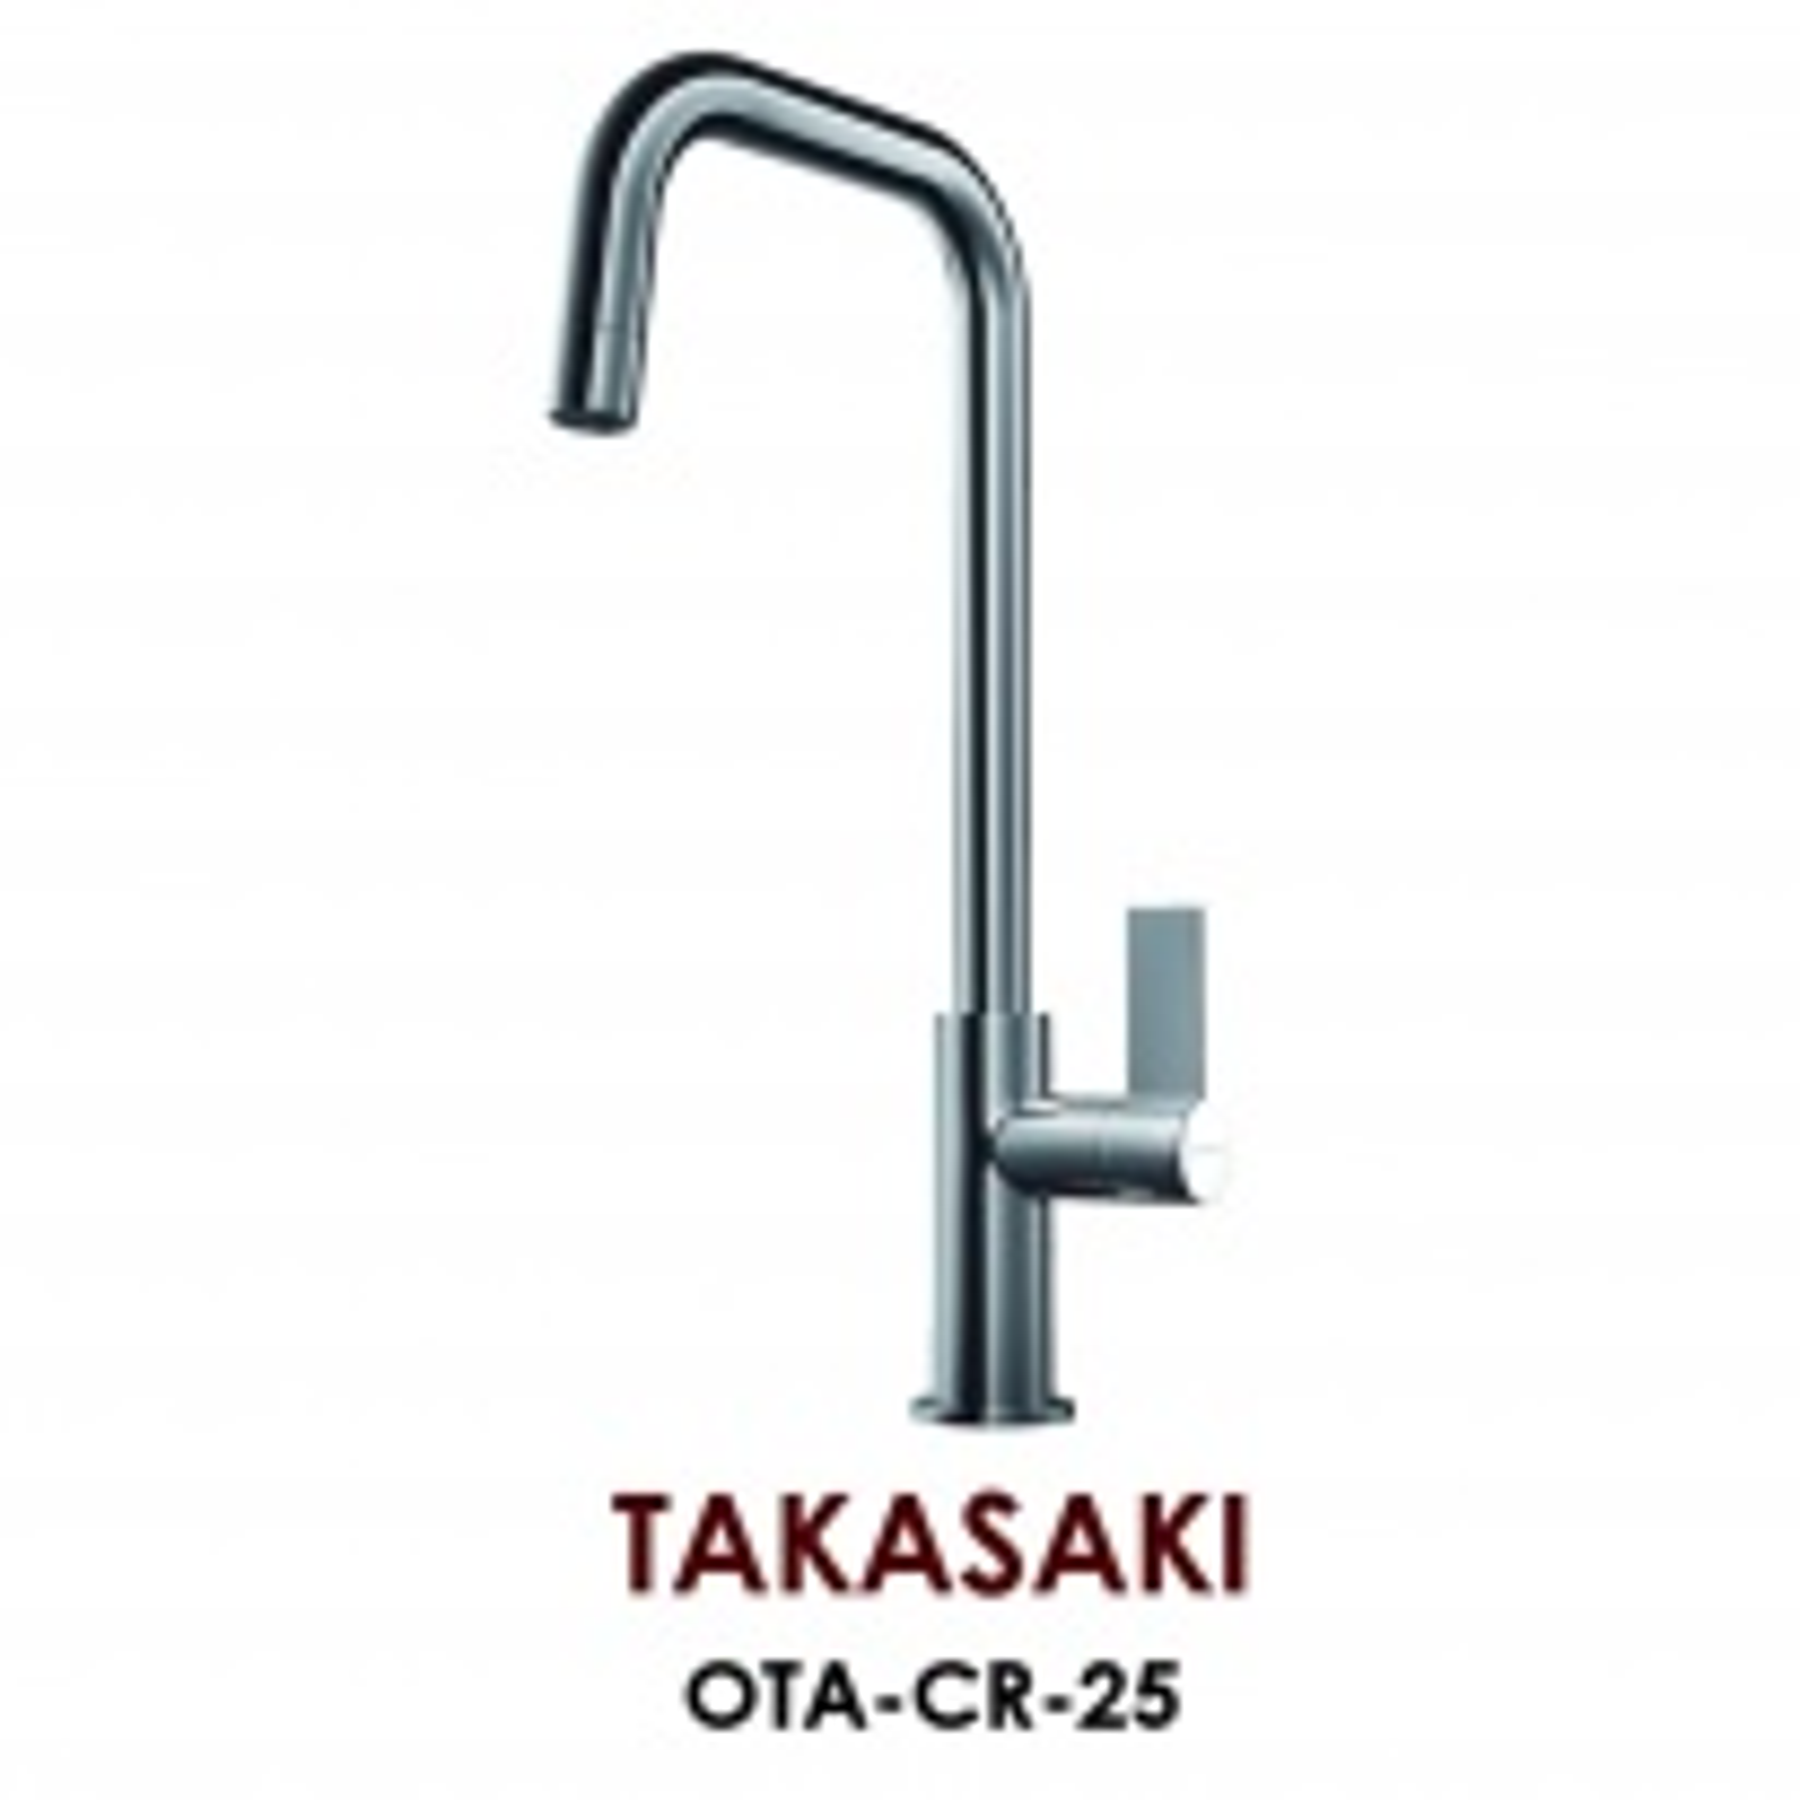 Смеситель Omoikiri Takasaki OTA-CR-25, арт. OTA-CR-25